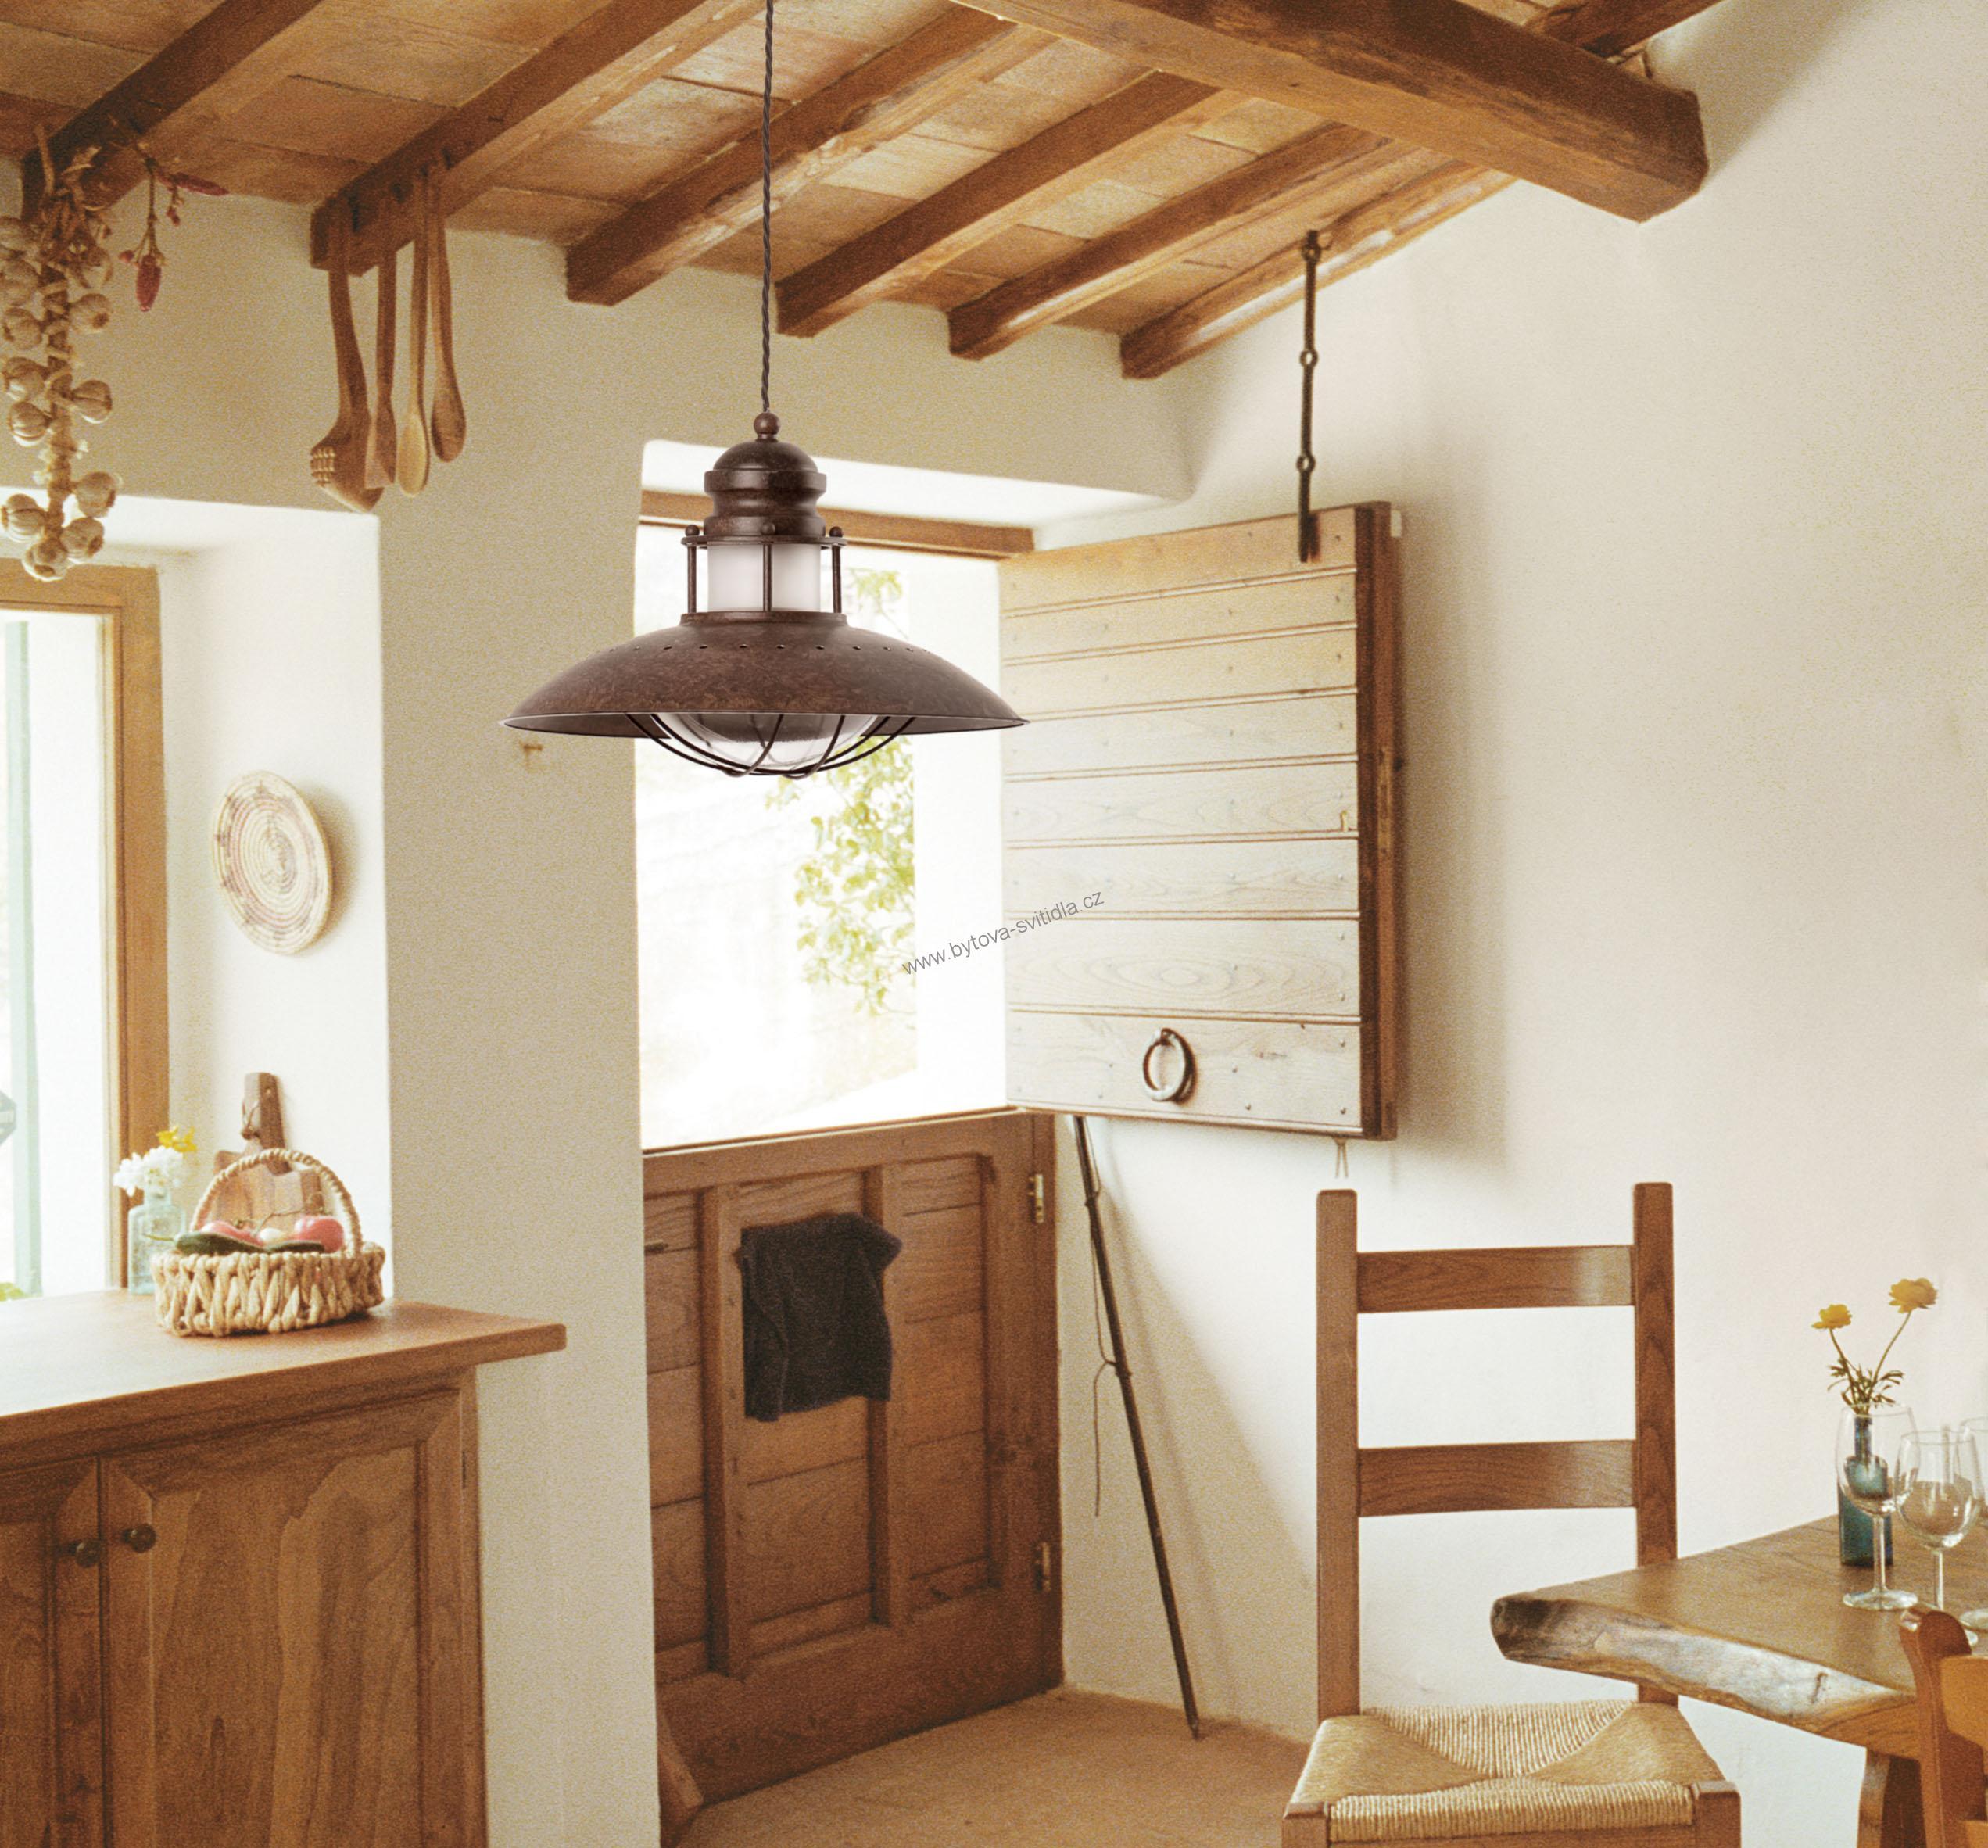 Faro 66204 winch retro z v sn lampa - Lamparas para pasillos casa ...